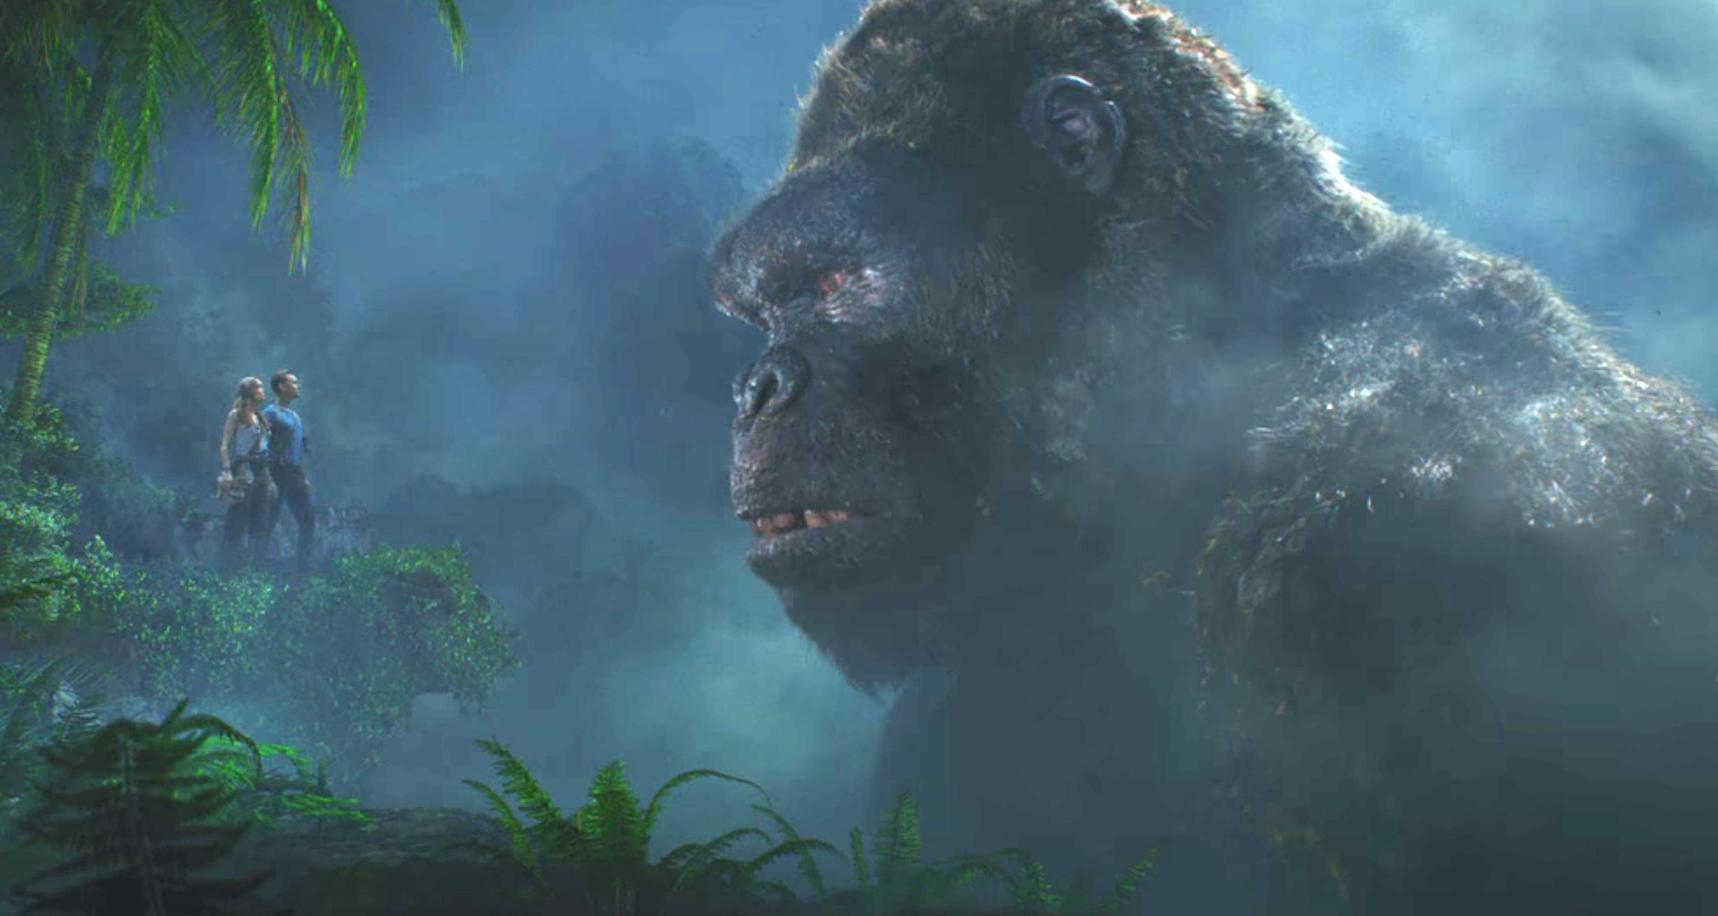 Kong - Skull Island (2017), Brie Larson, Tom Hiddleston